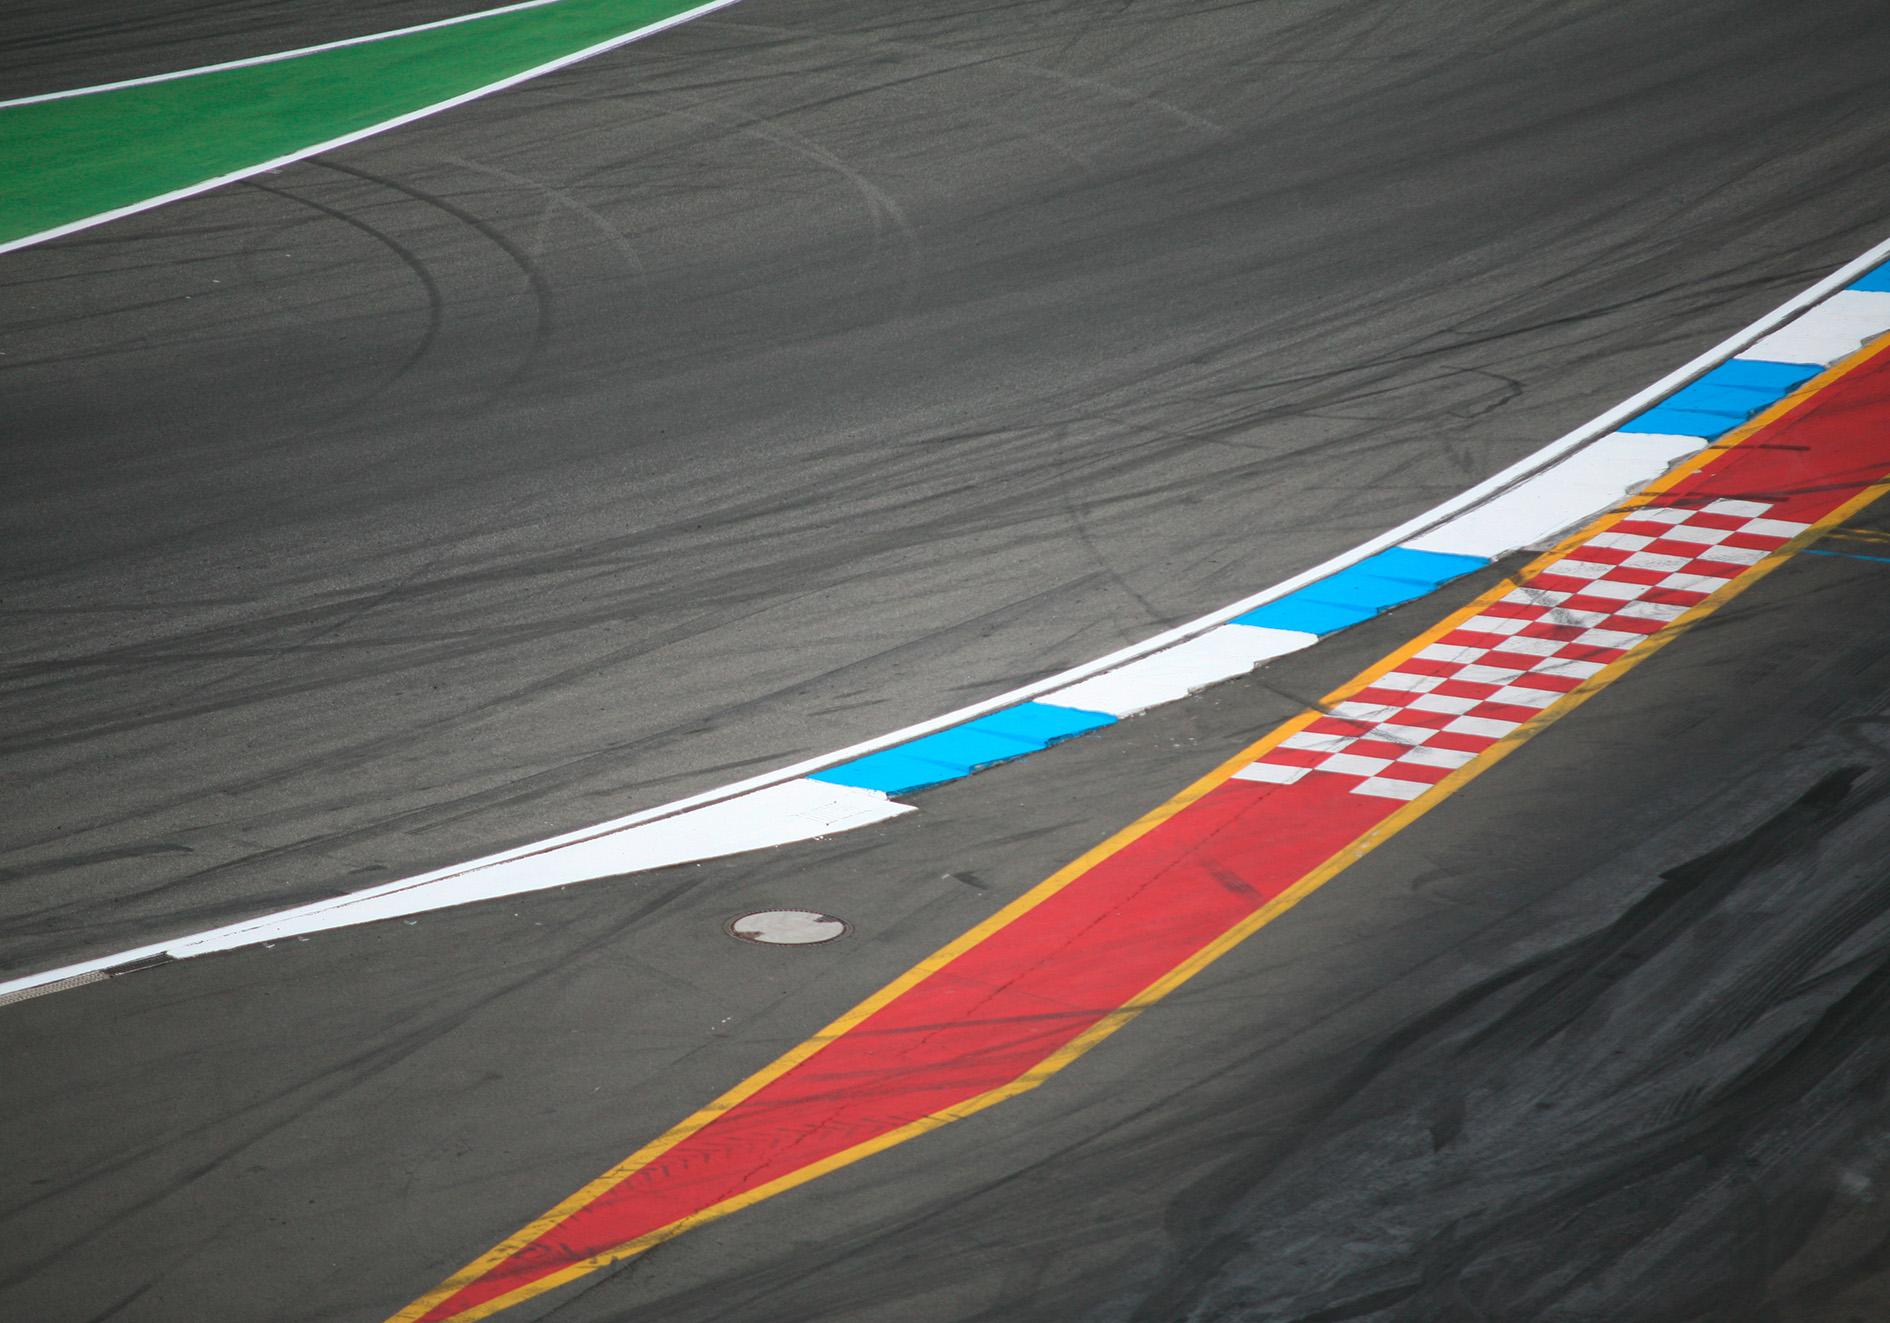 18_Josekdesign_Toyota_F1_Fotografie.jpg